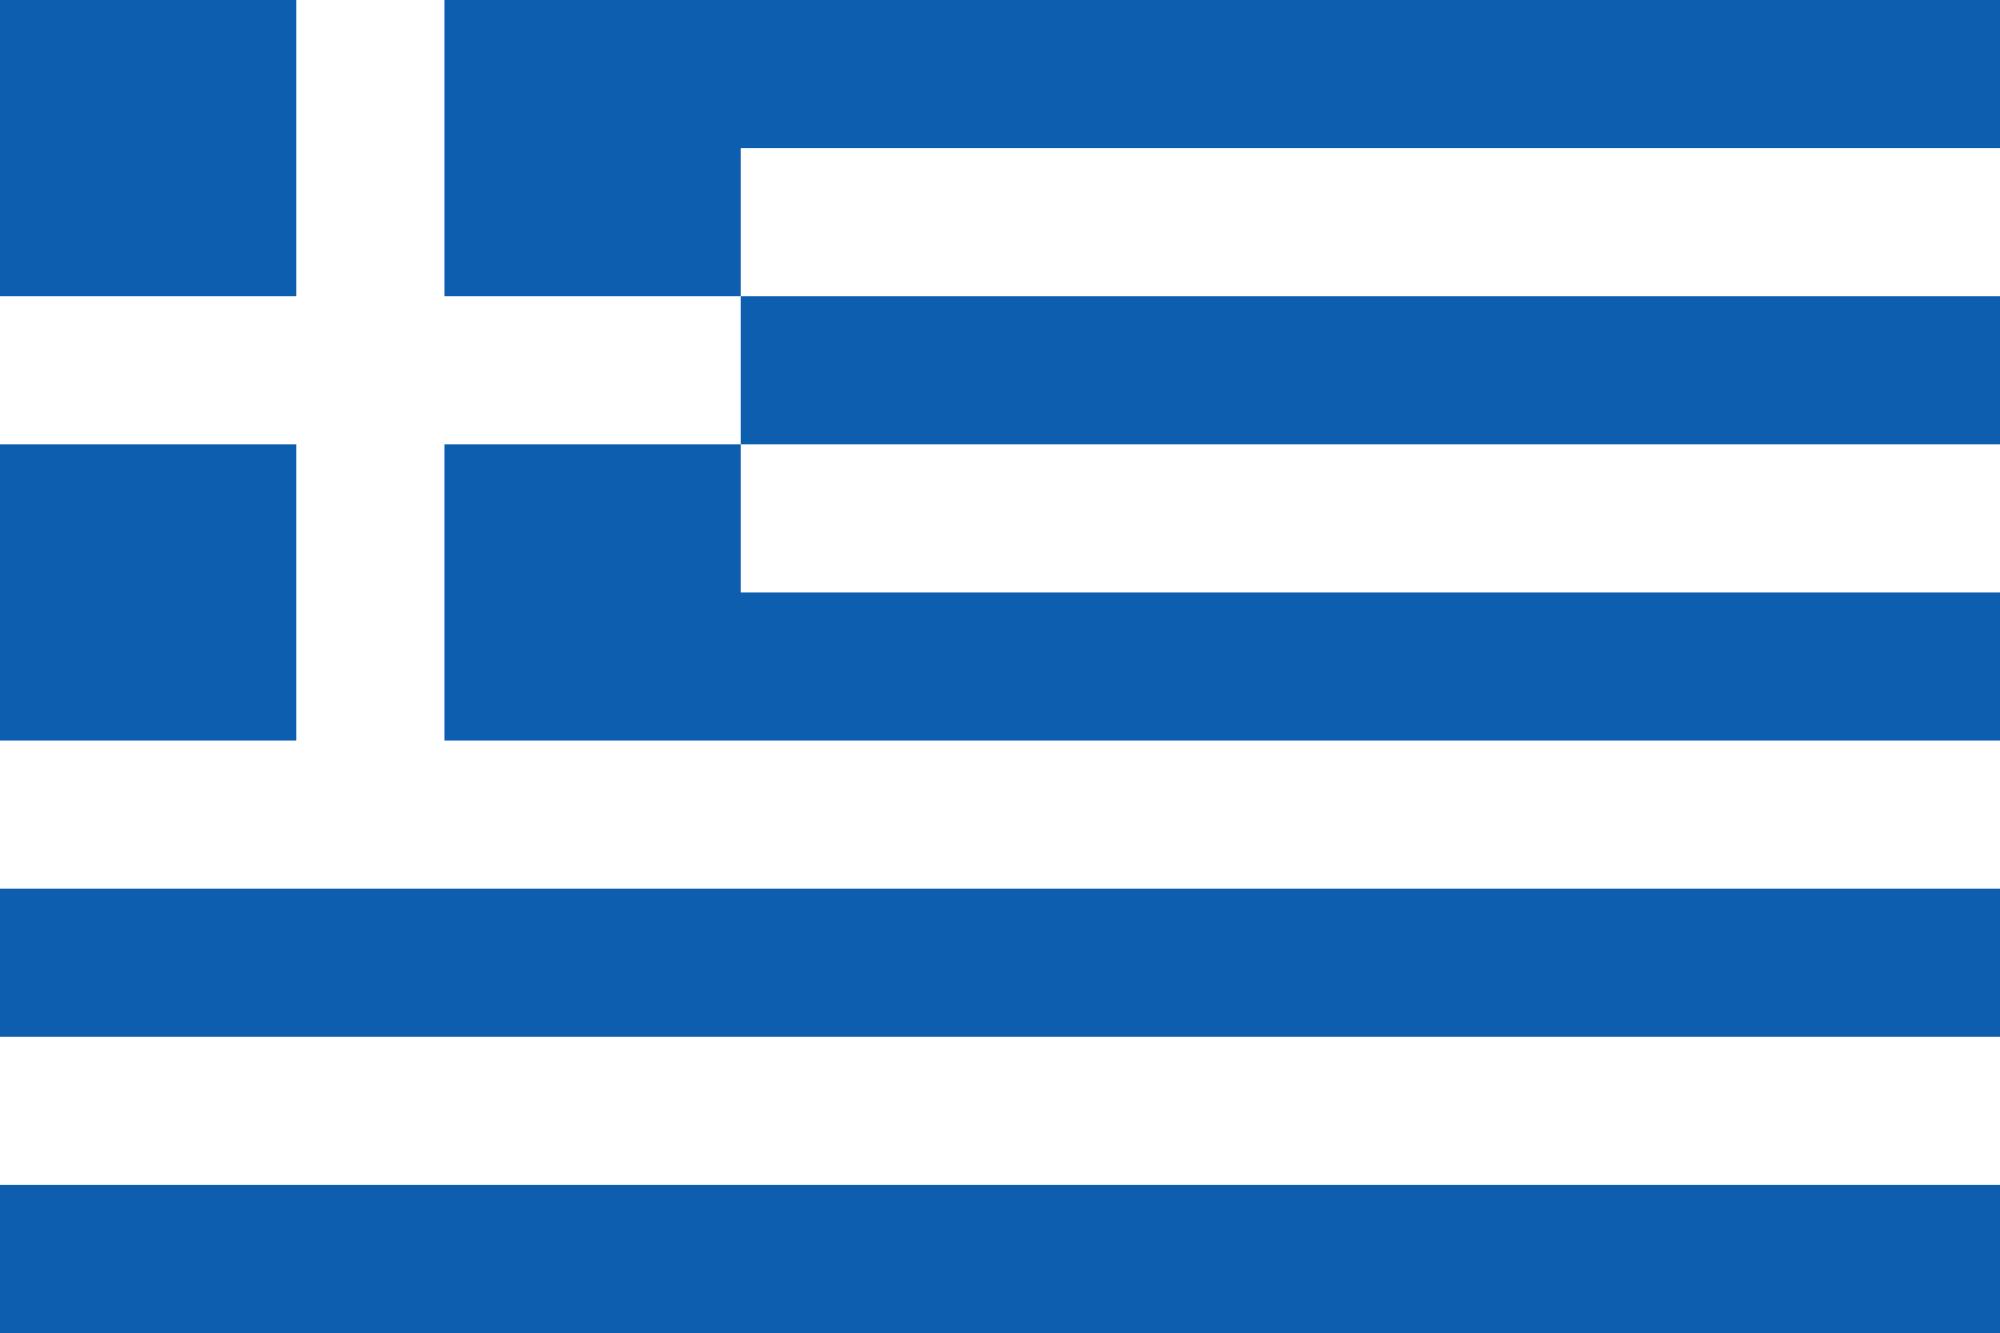 High Resolution Wallpaper | Flag Of Greece 2000x1333 px